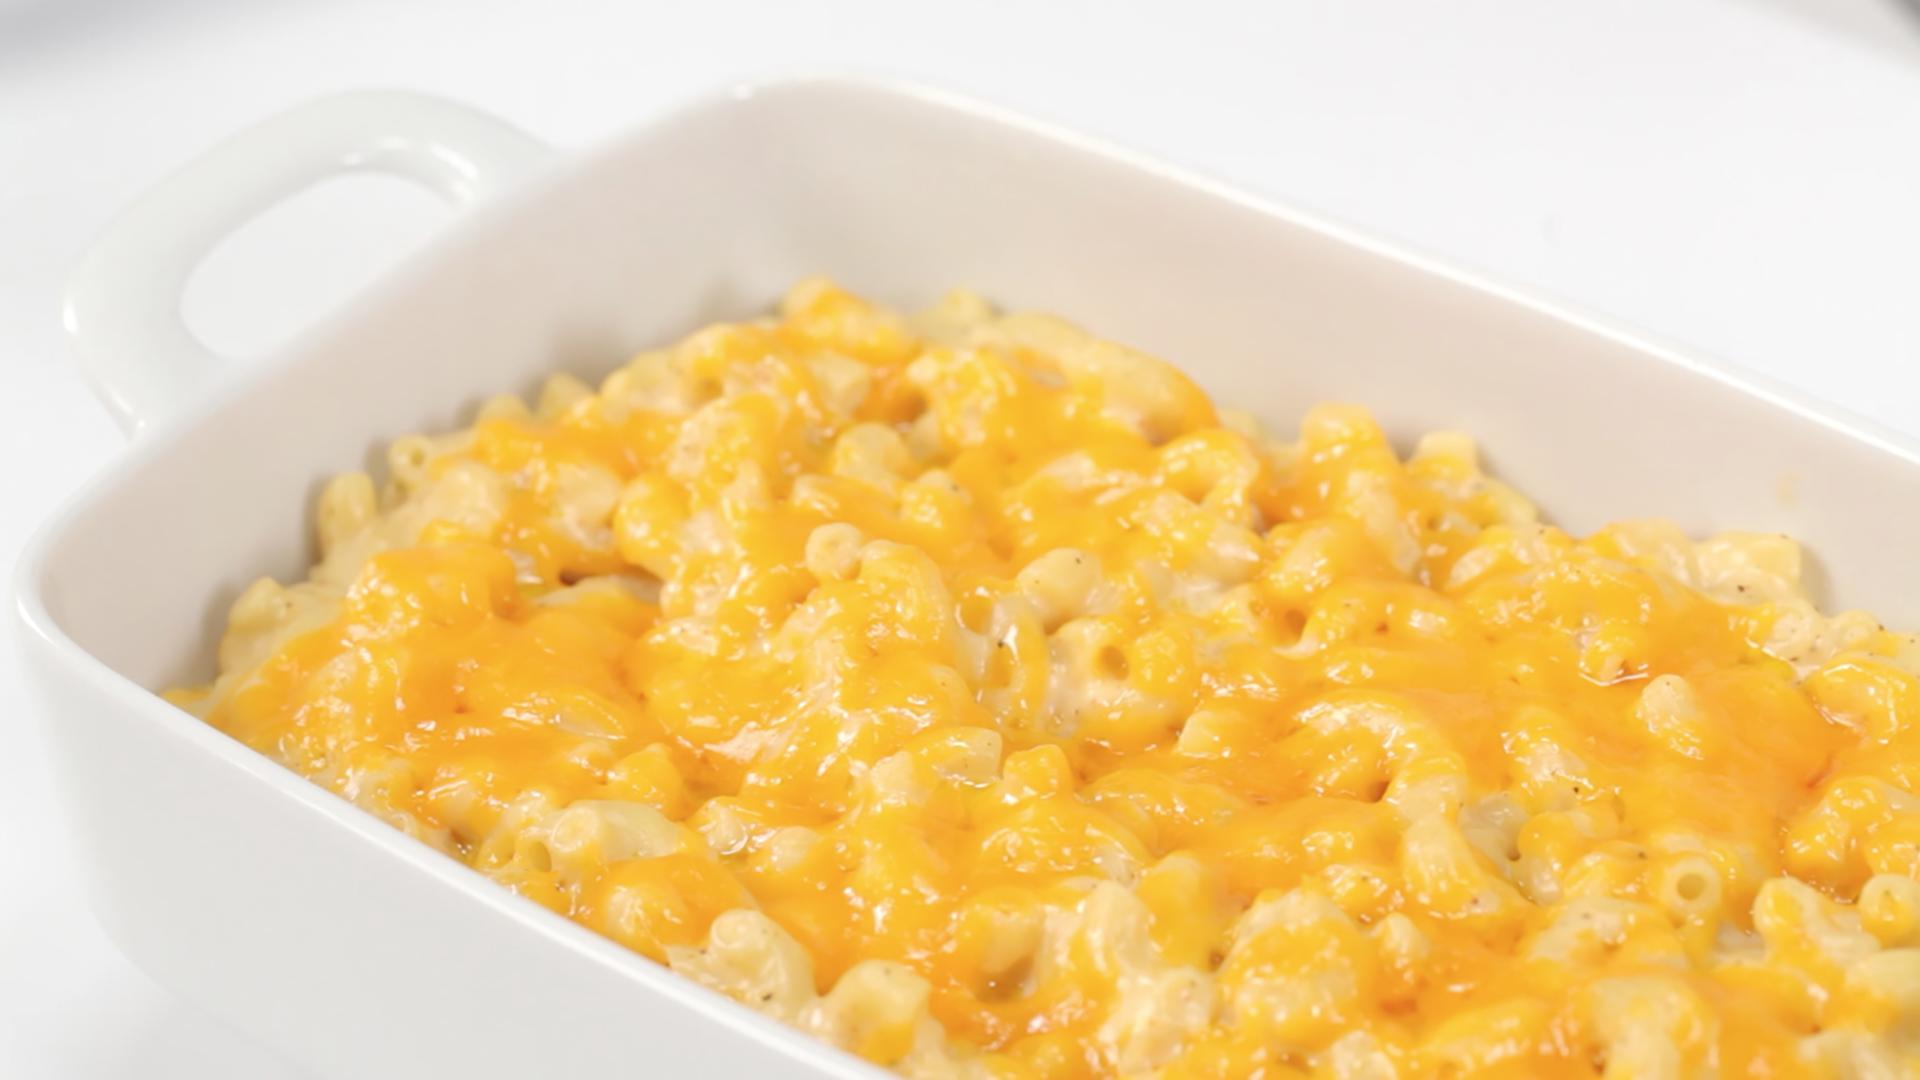 Classic Baked Macaroni And Cheese Recipe Myrecipes